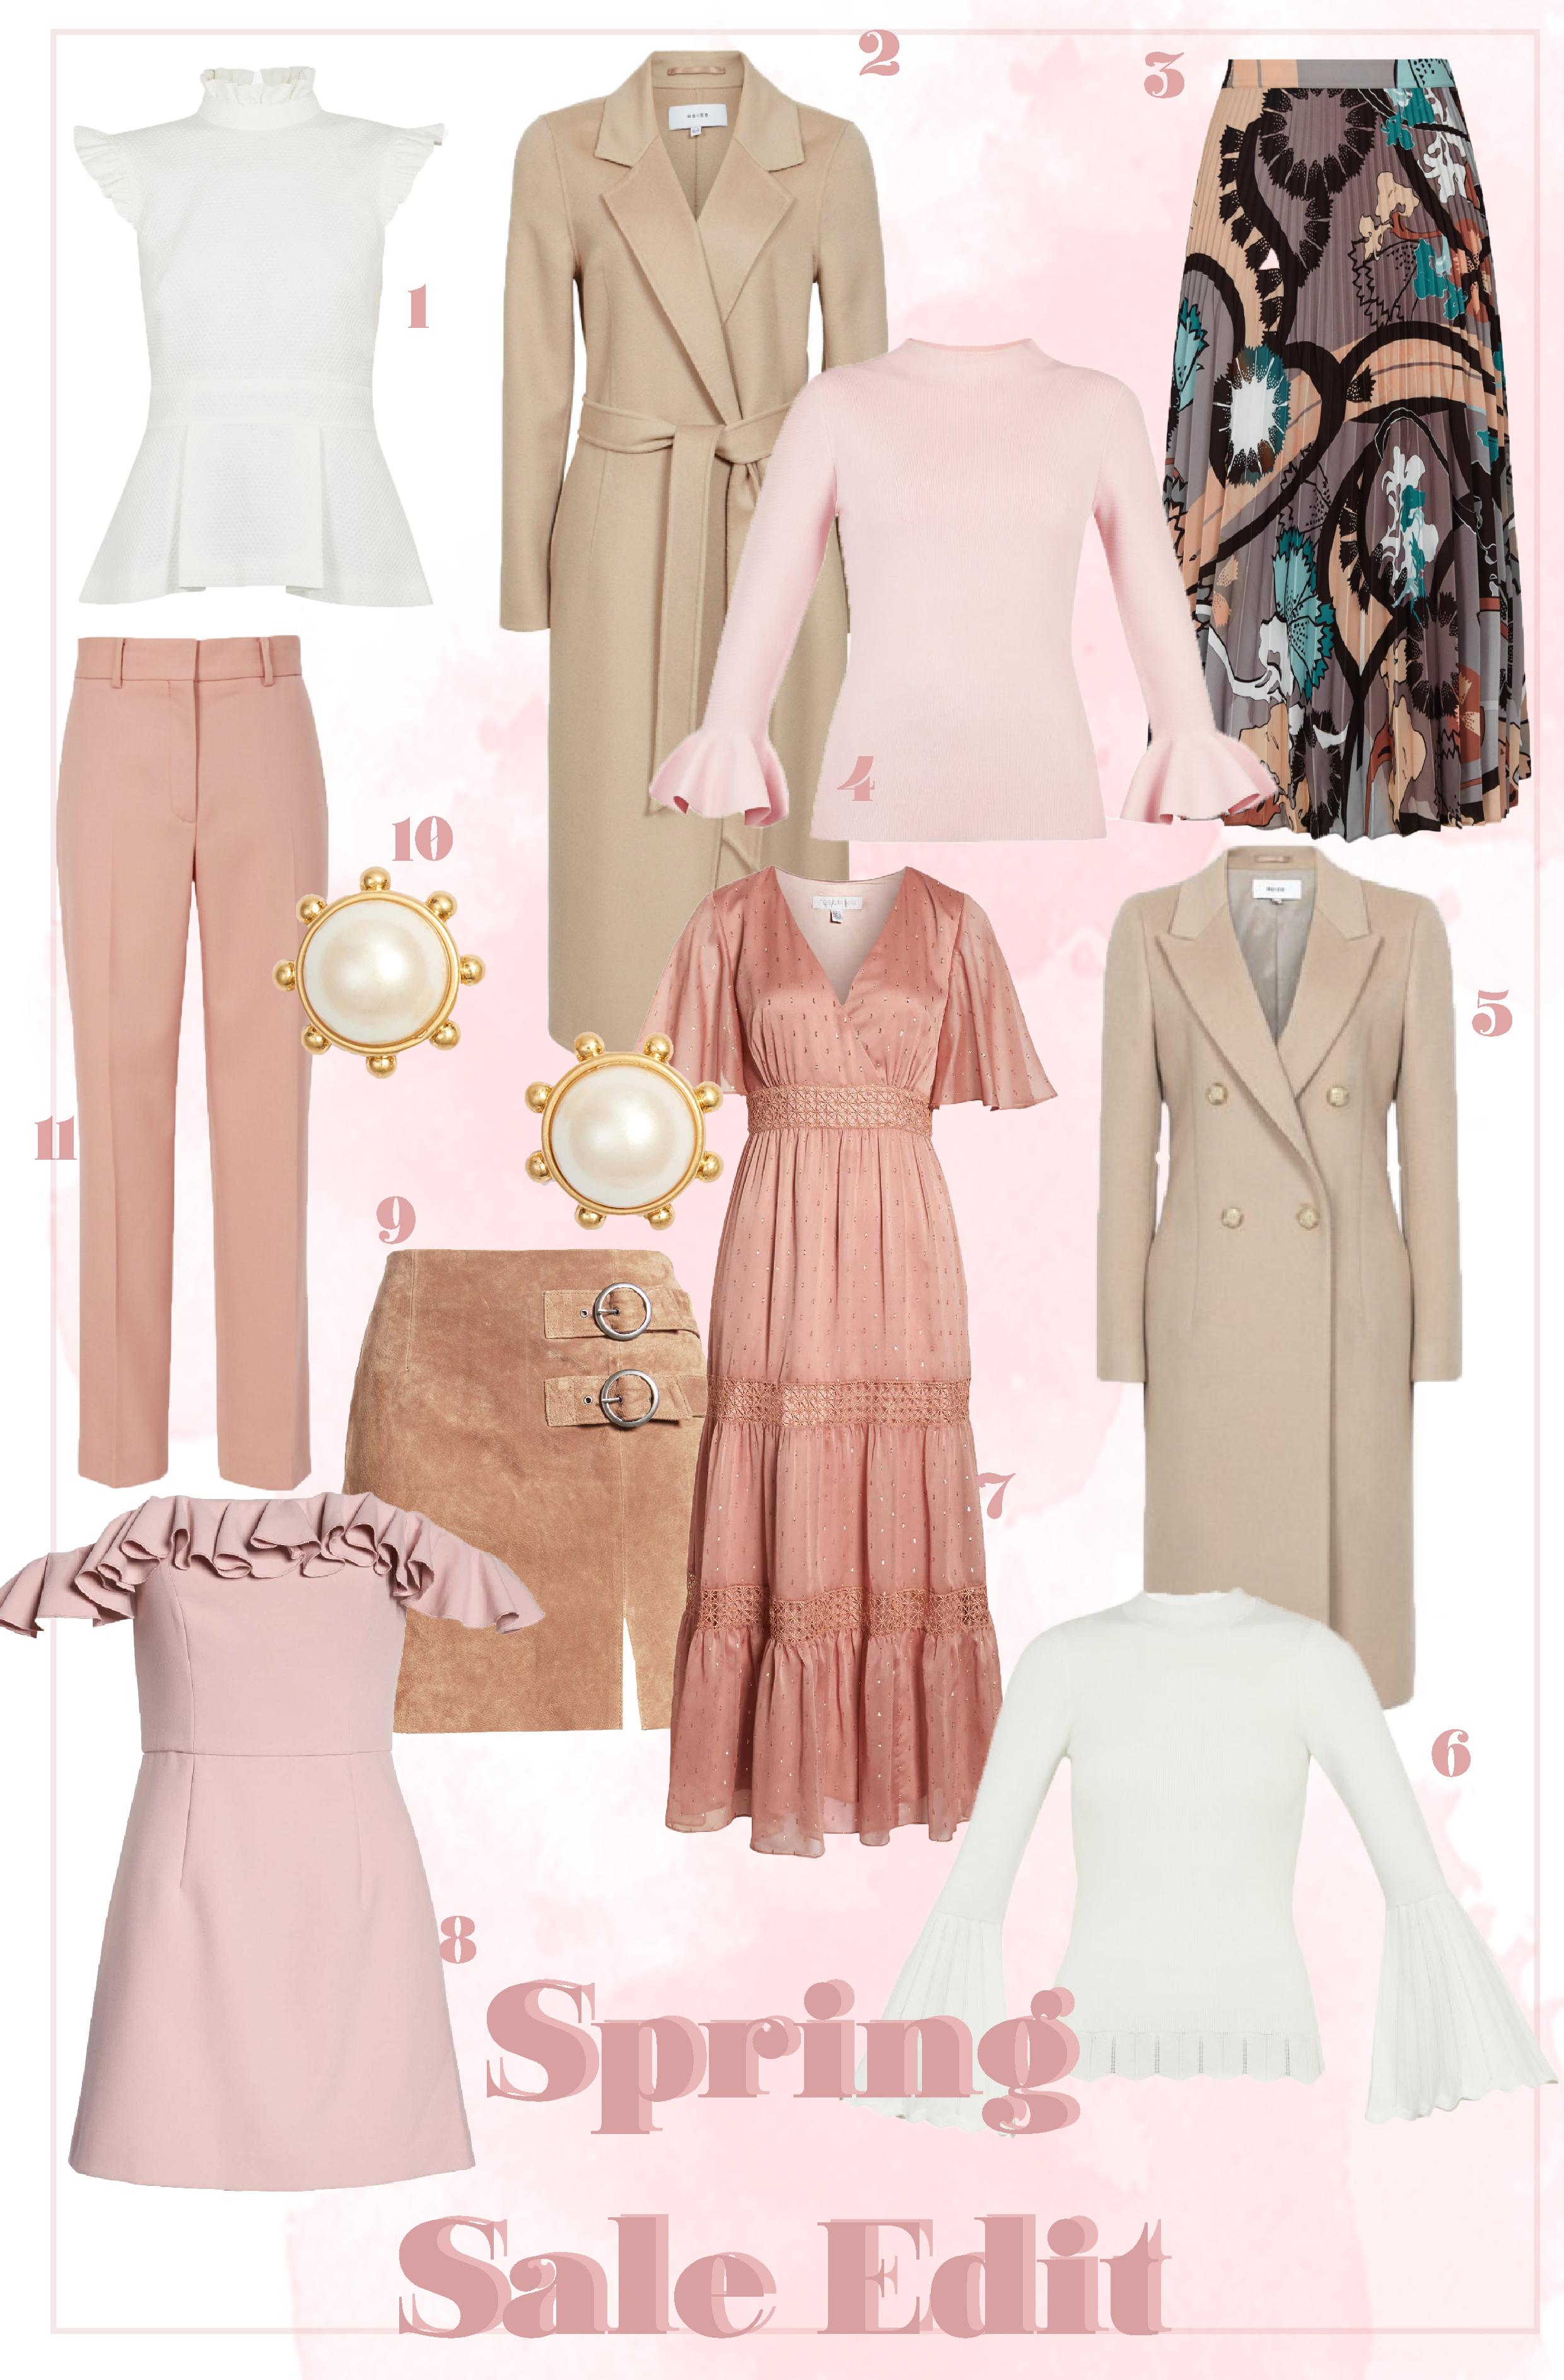 7abb38316 Spring Sale Edit - What To Buy! - Fashion Mumblr